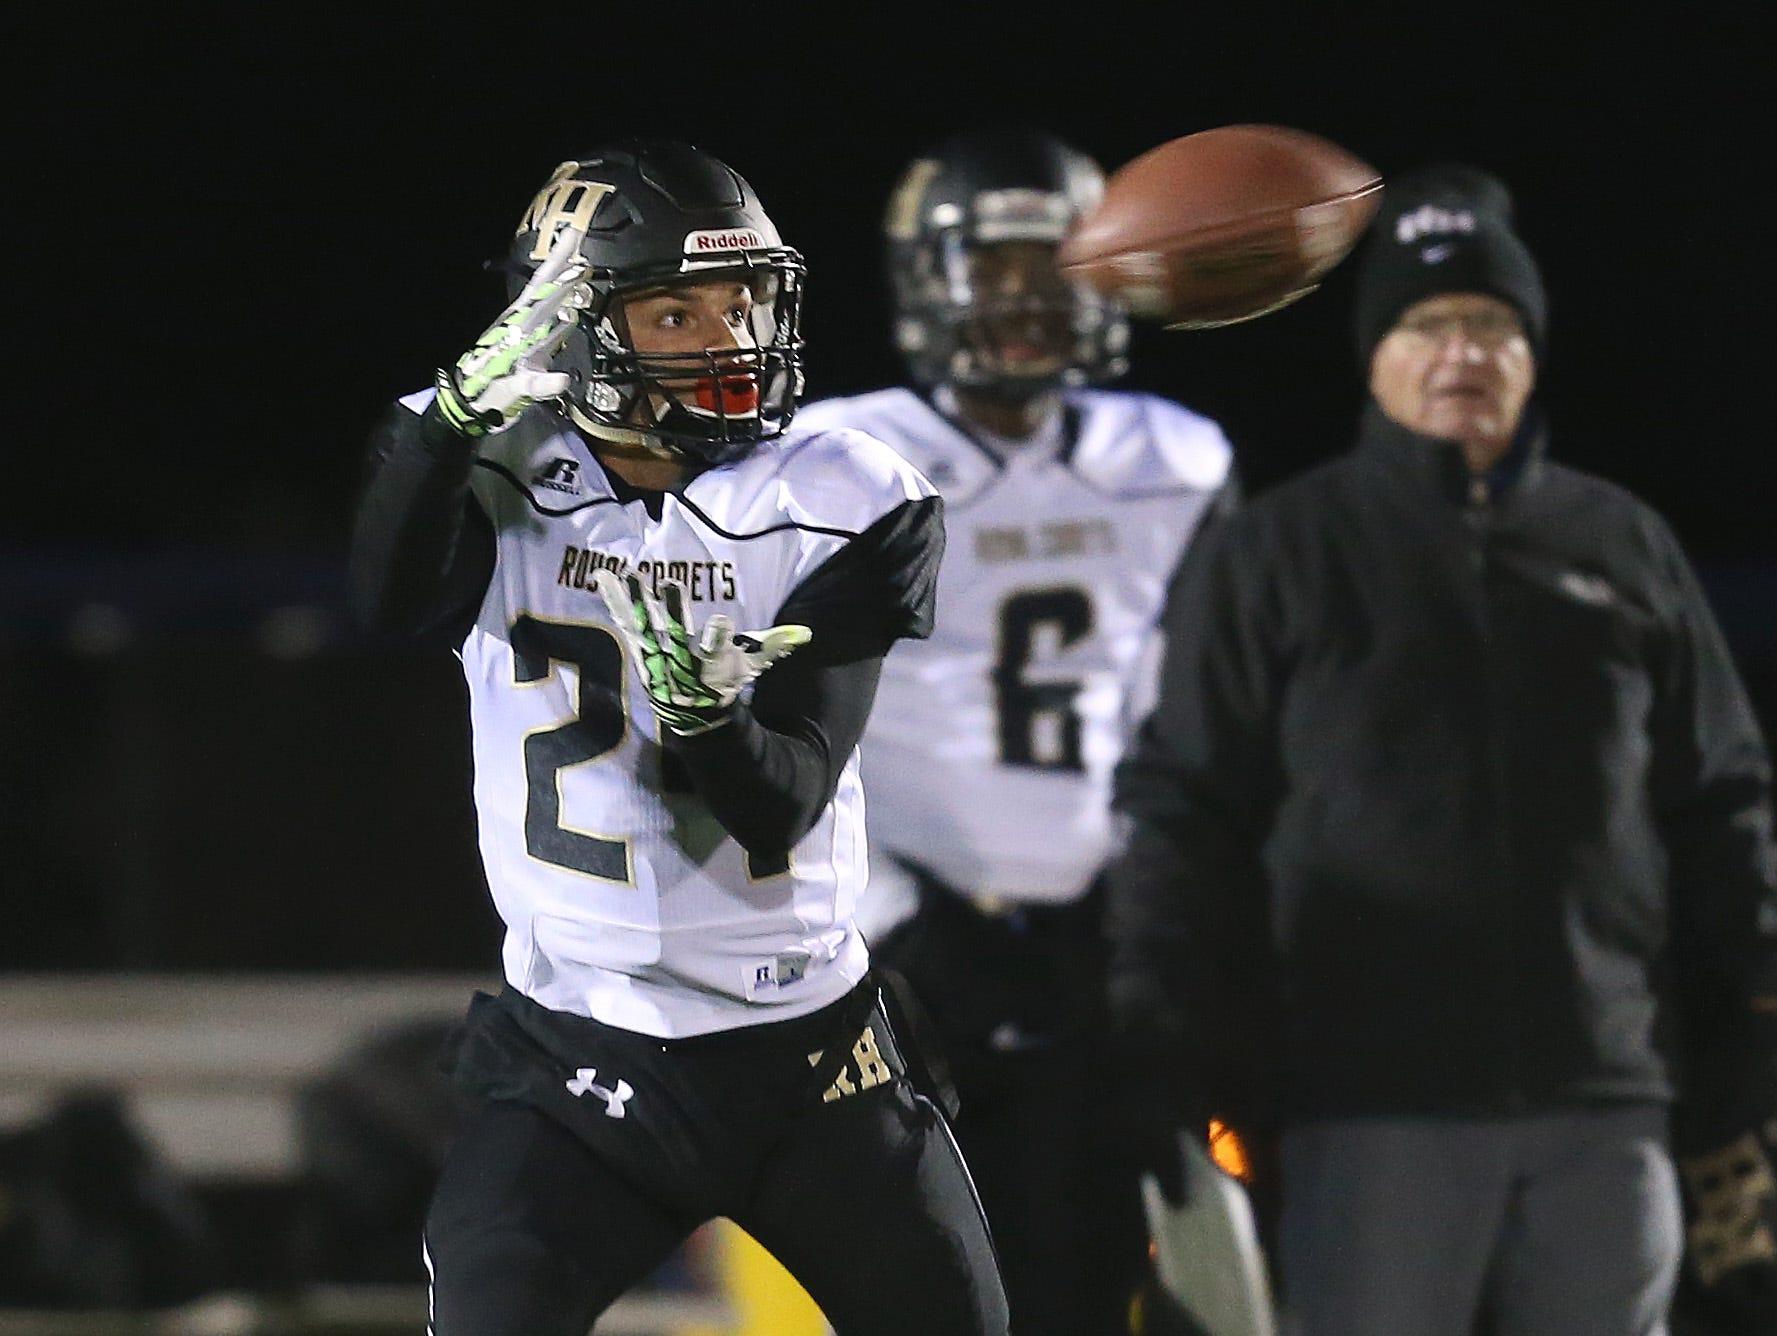 Rush-Henrietta's Joseph Ortiz hauls in a catch and runs for a 74-yard touchdown against Pittsford.